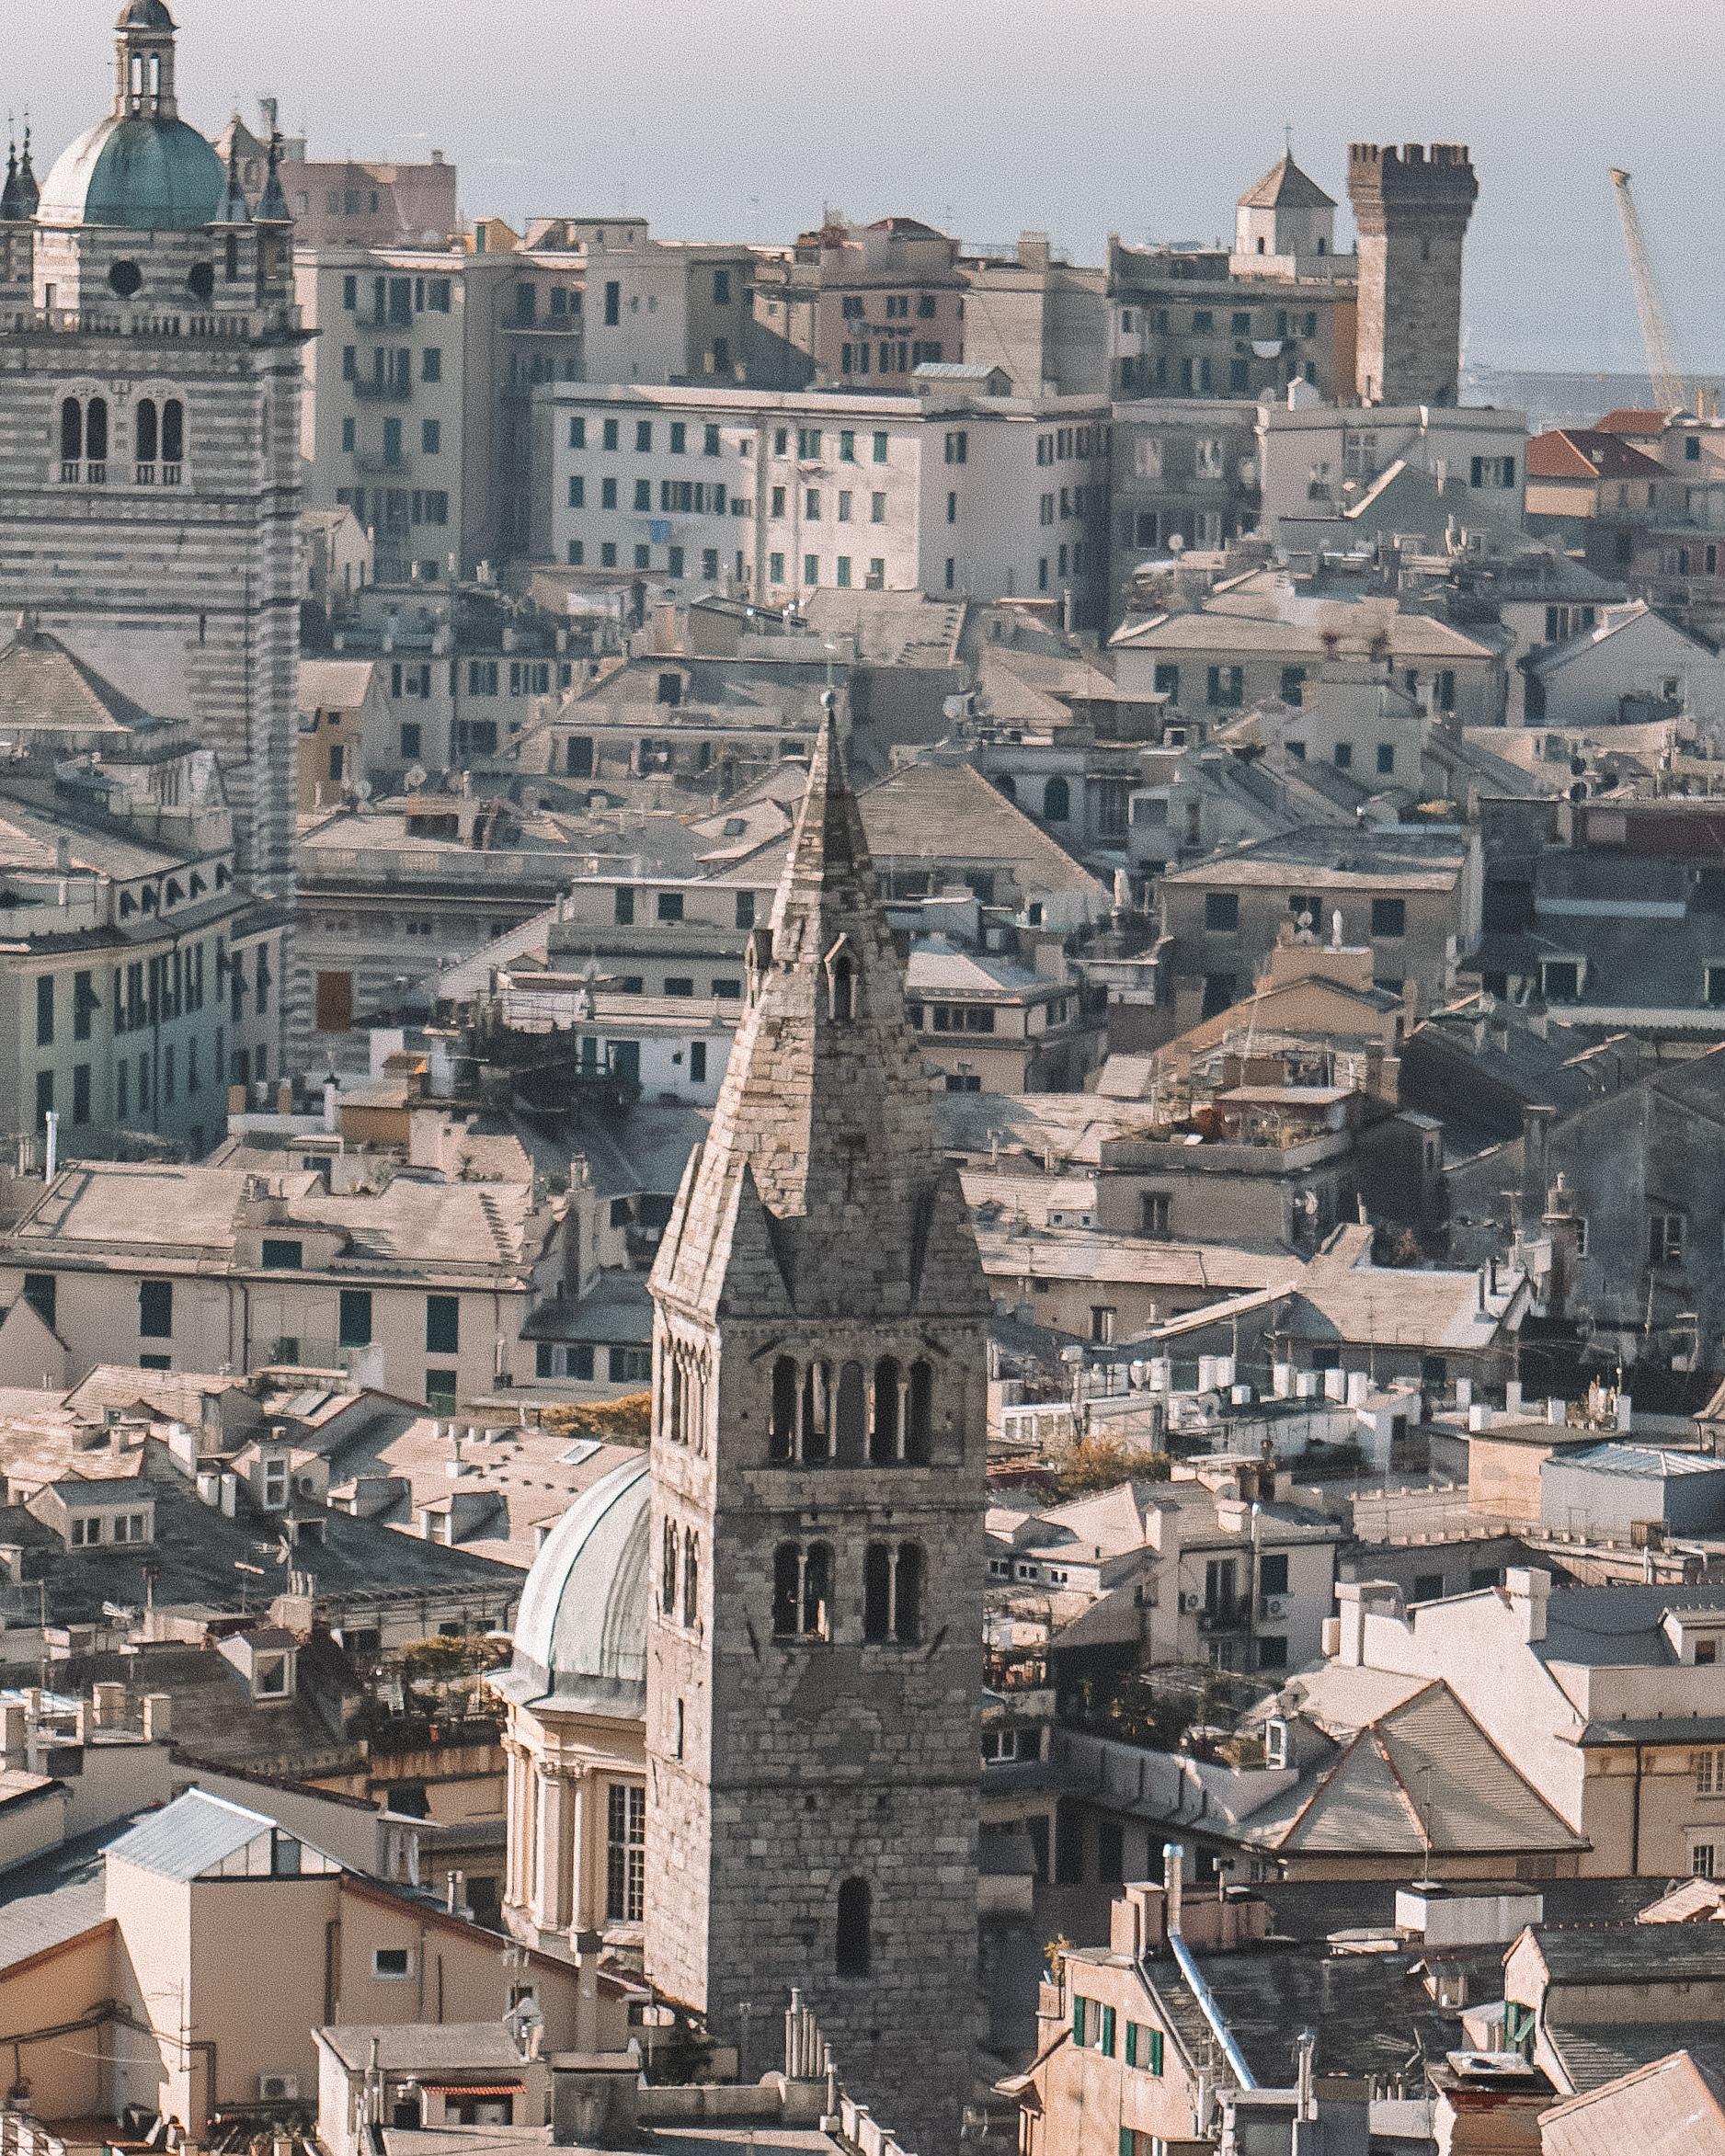 Overlooking Genoa, Italy